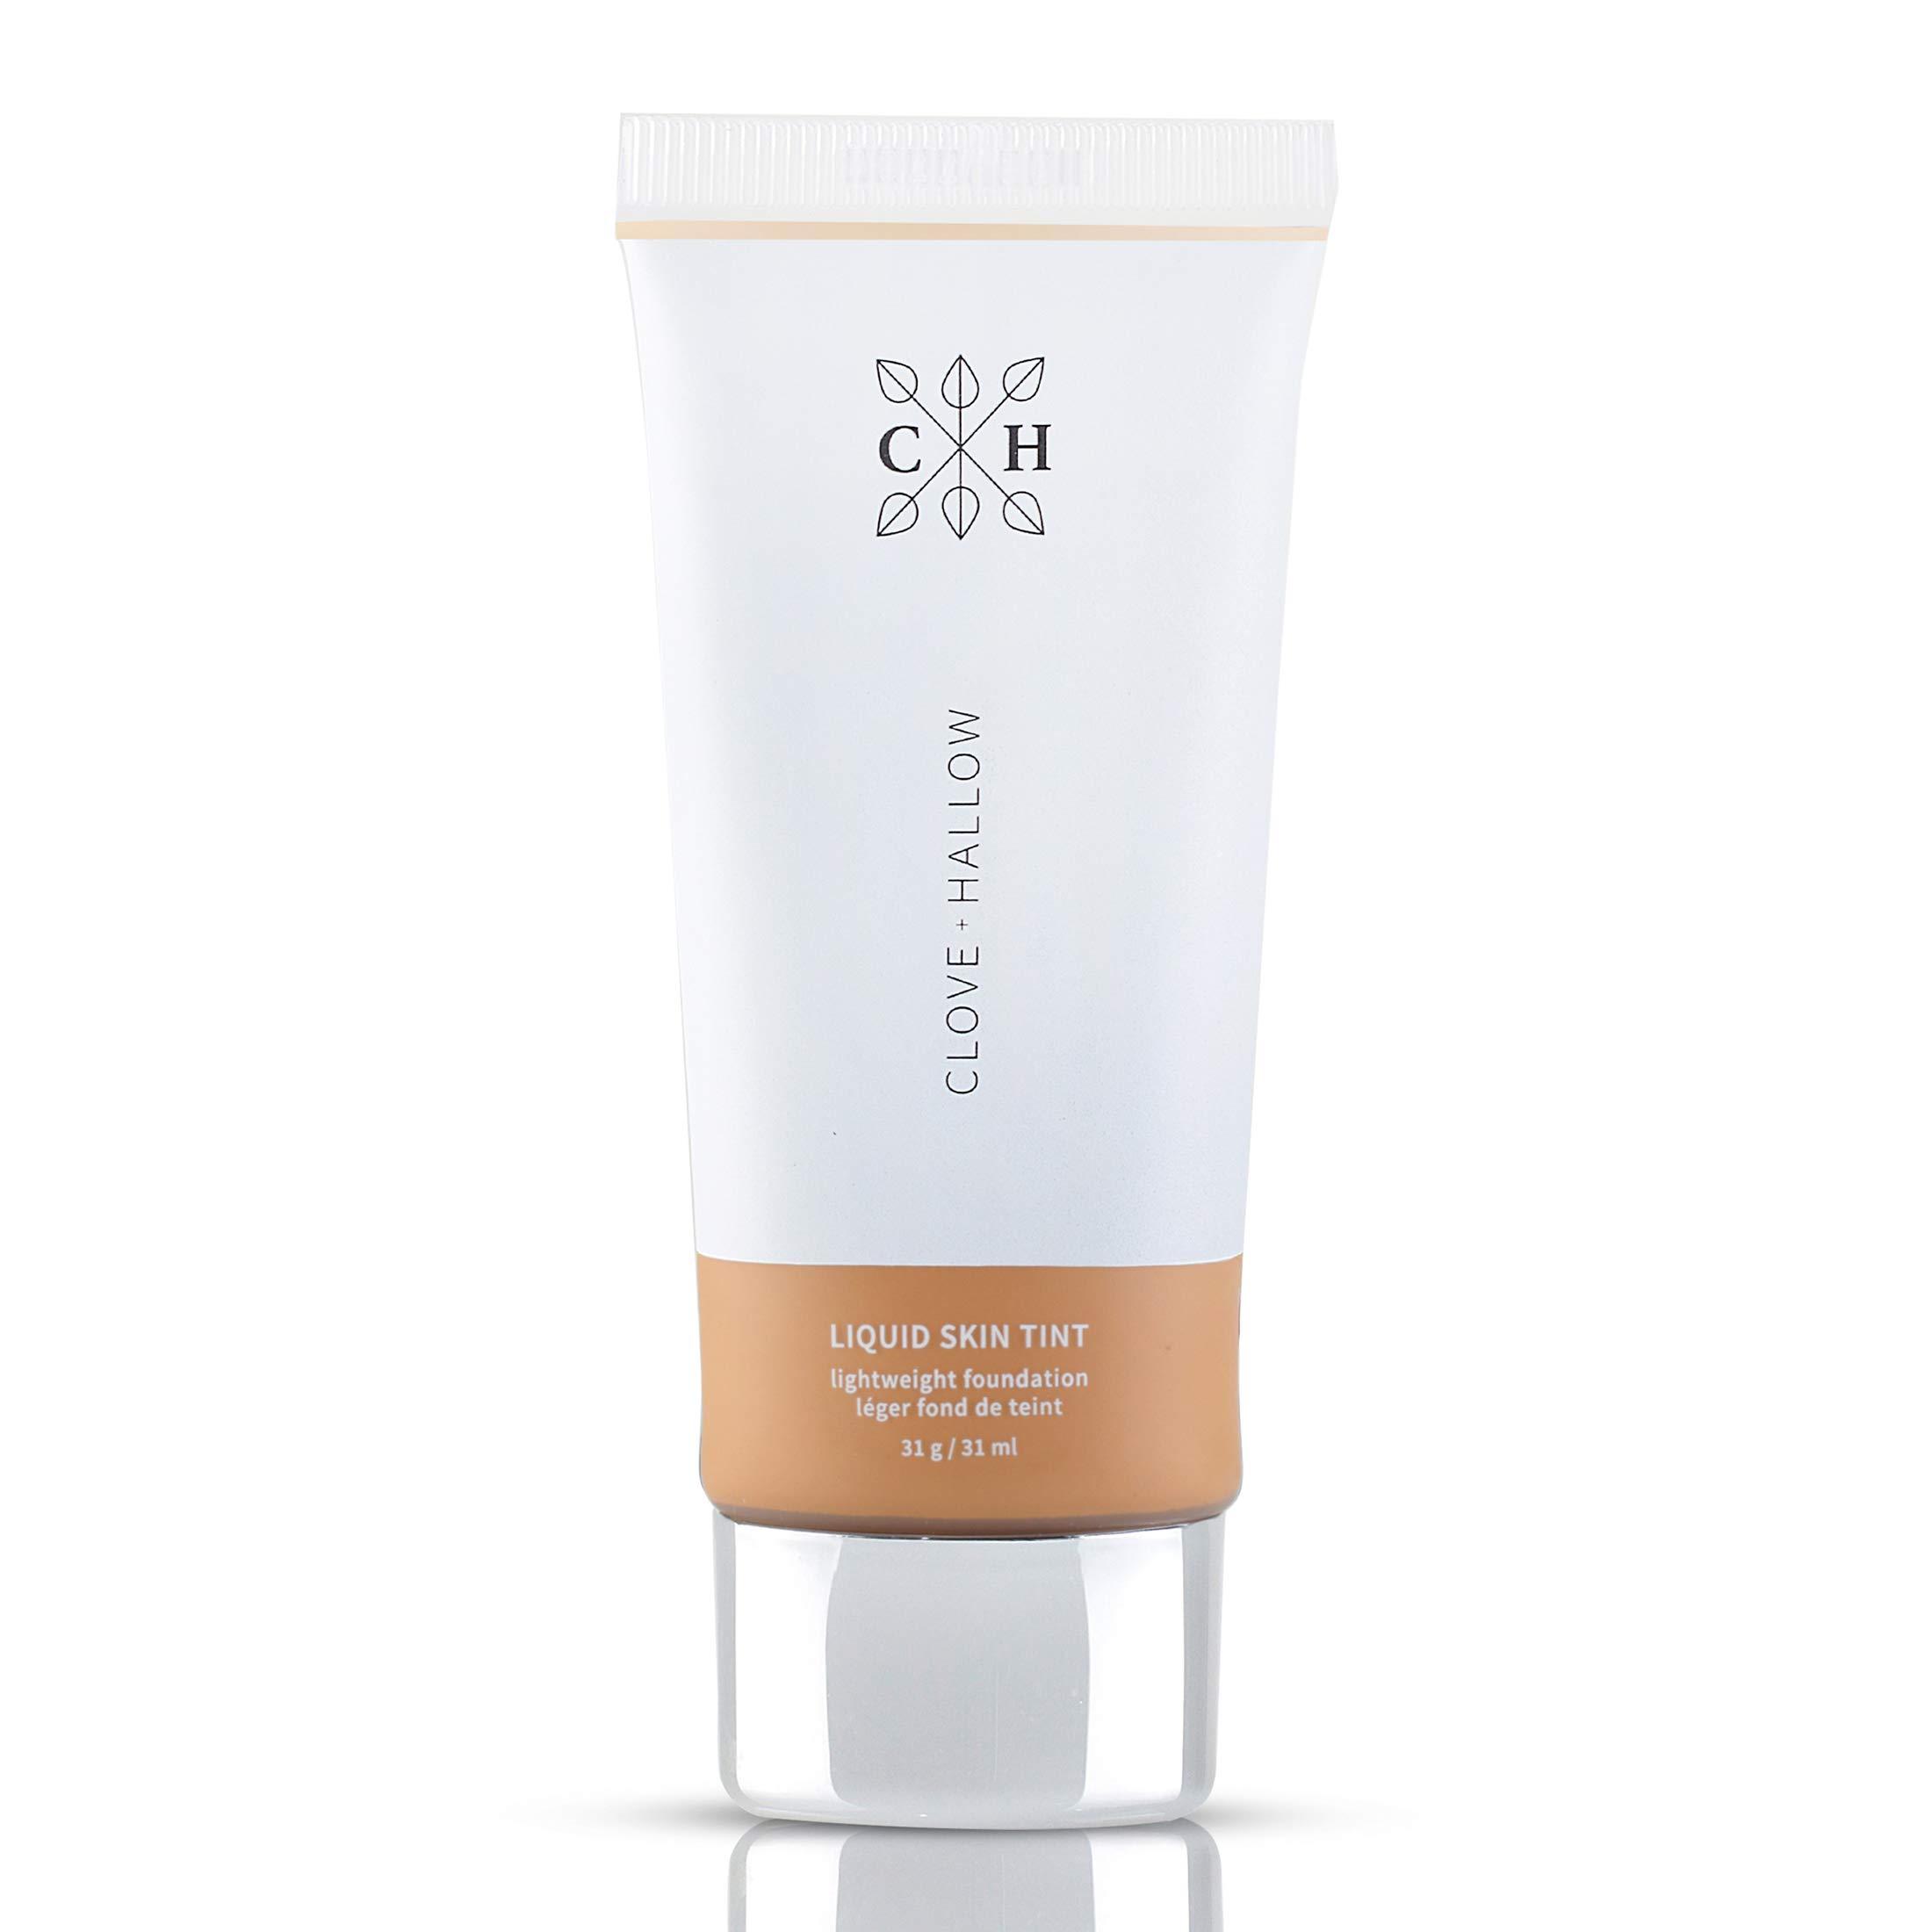 CLOVE + HALLOW Liquid Skin Tint Liquid Foundation Organic Makeup-09